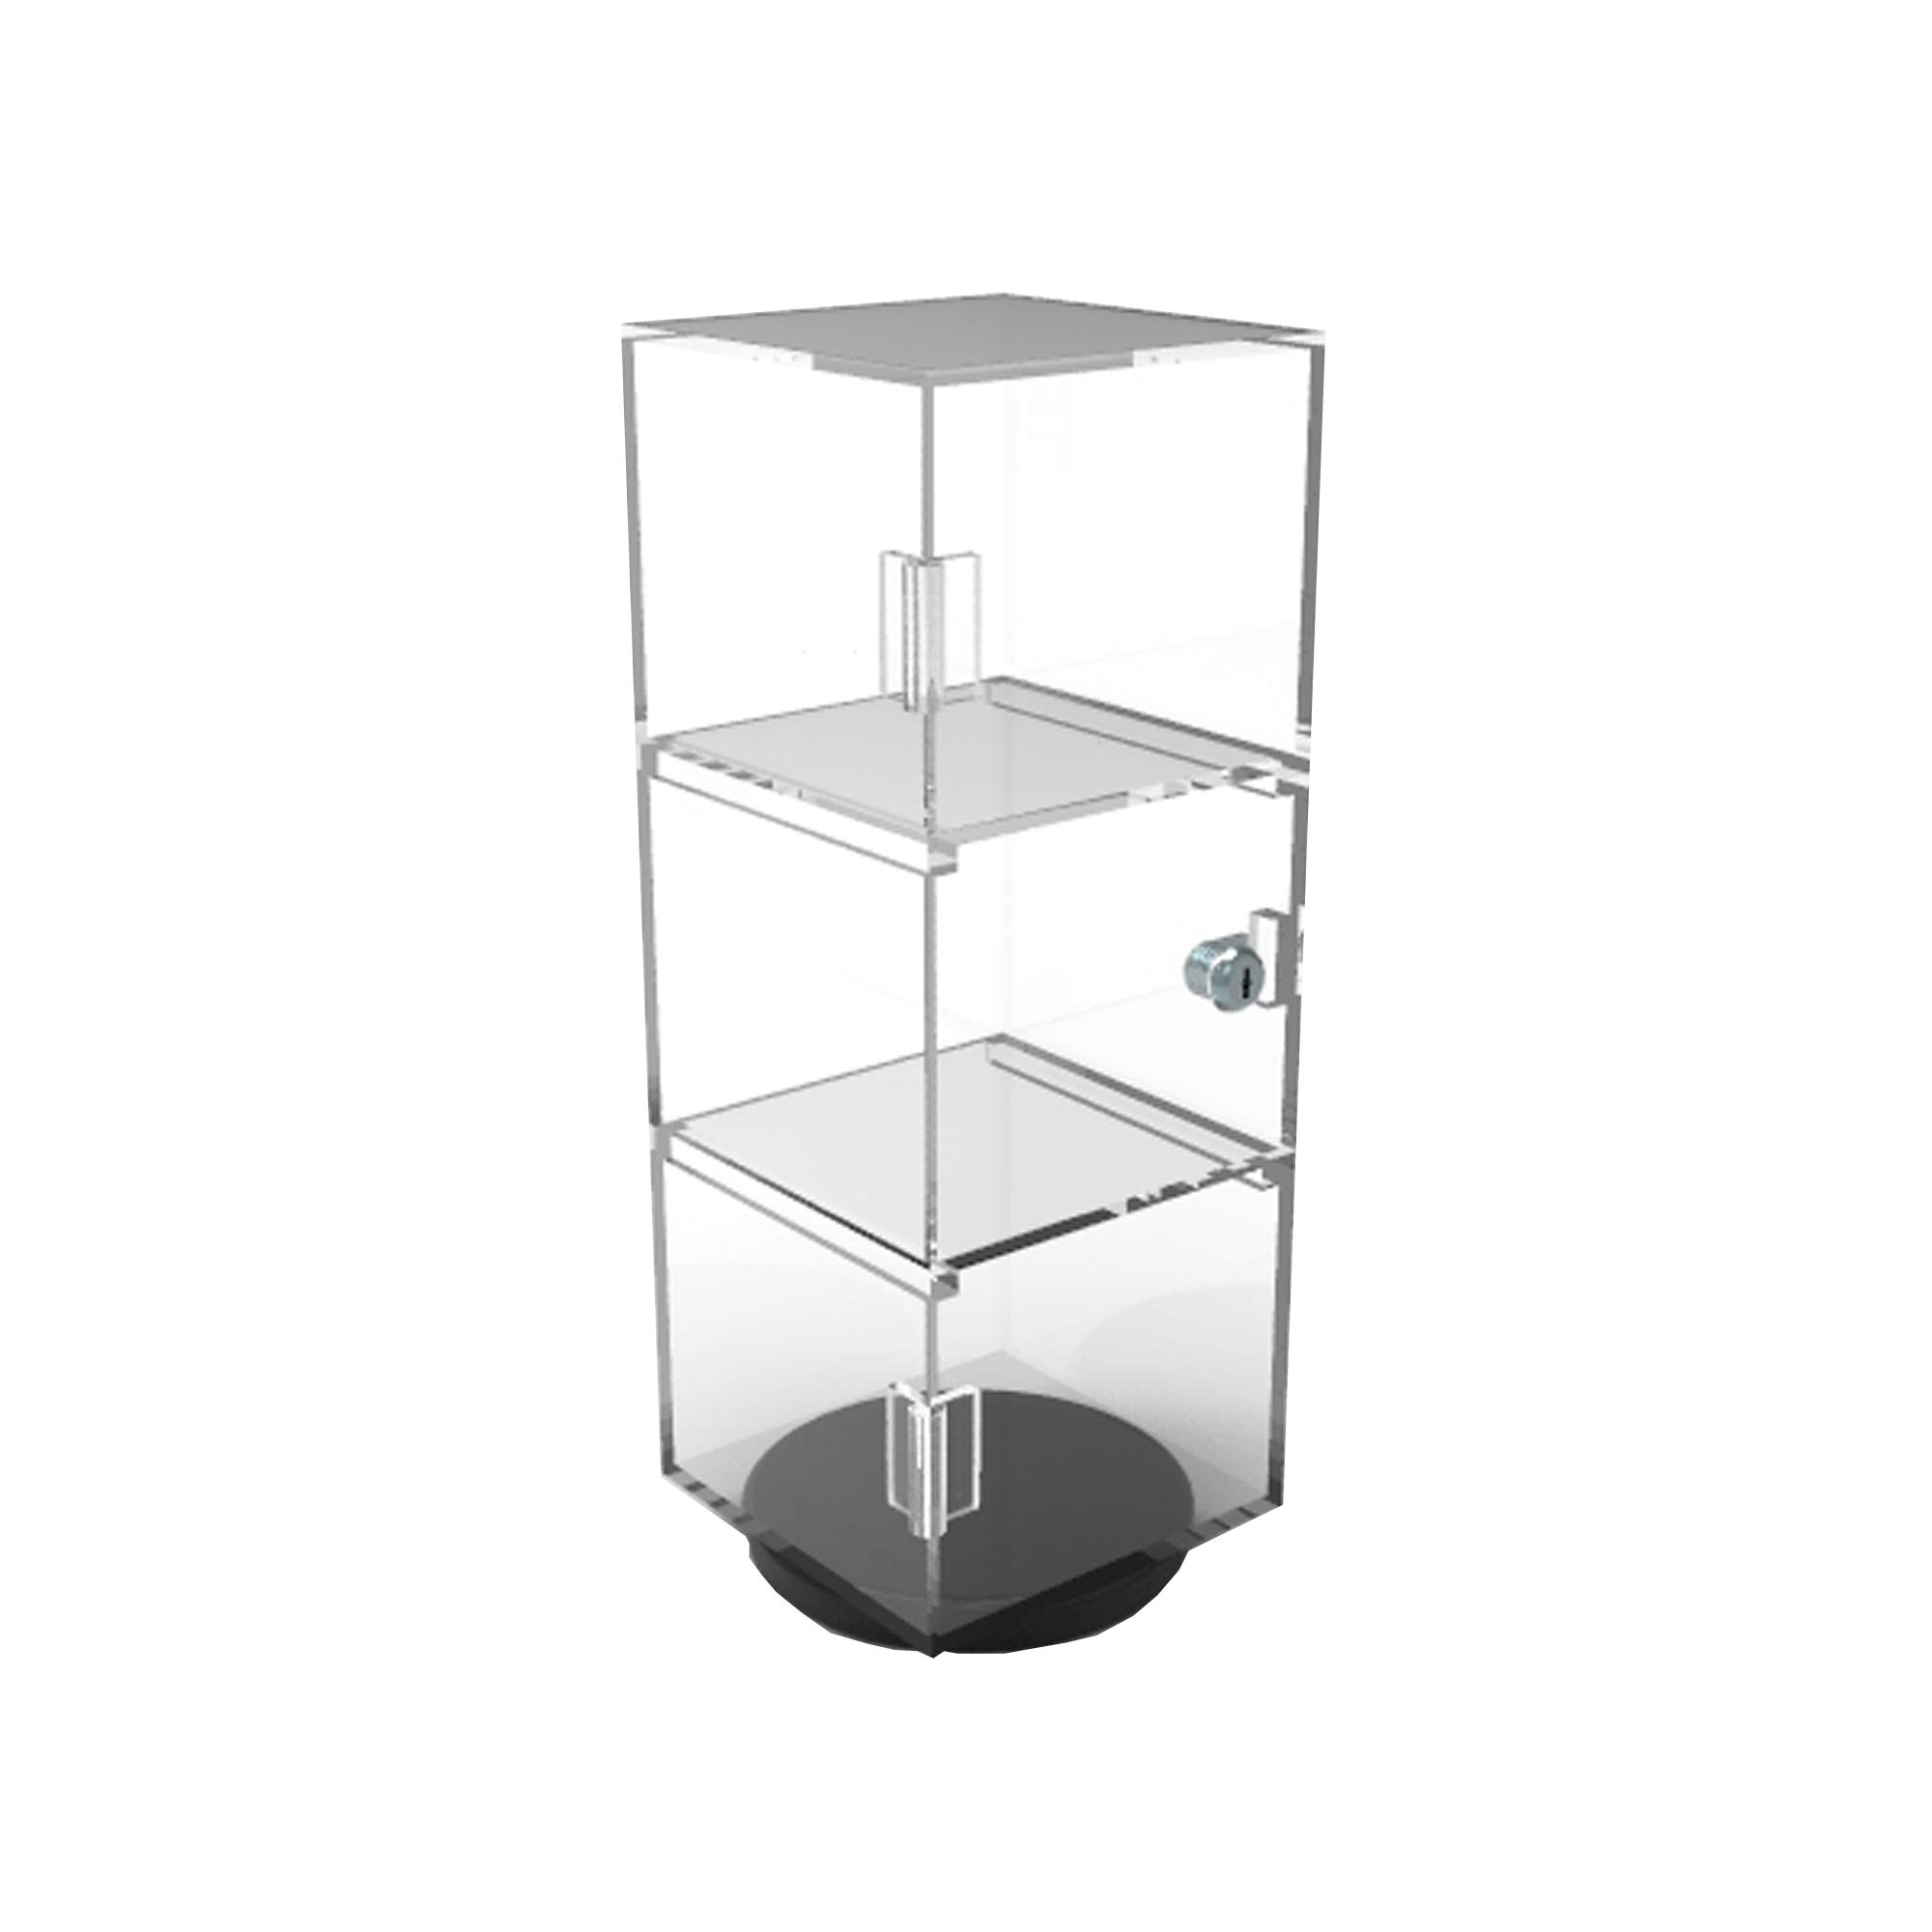 FixtureDisplays 6x6x16'' Rotating Mini Plexiglass Lucite Clear Acrylic Tower Showcase Display 20000 by FixtureDisplays (Image #1)